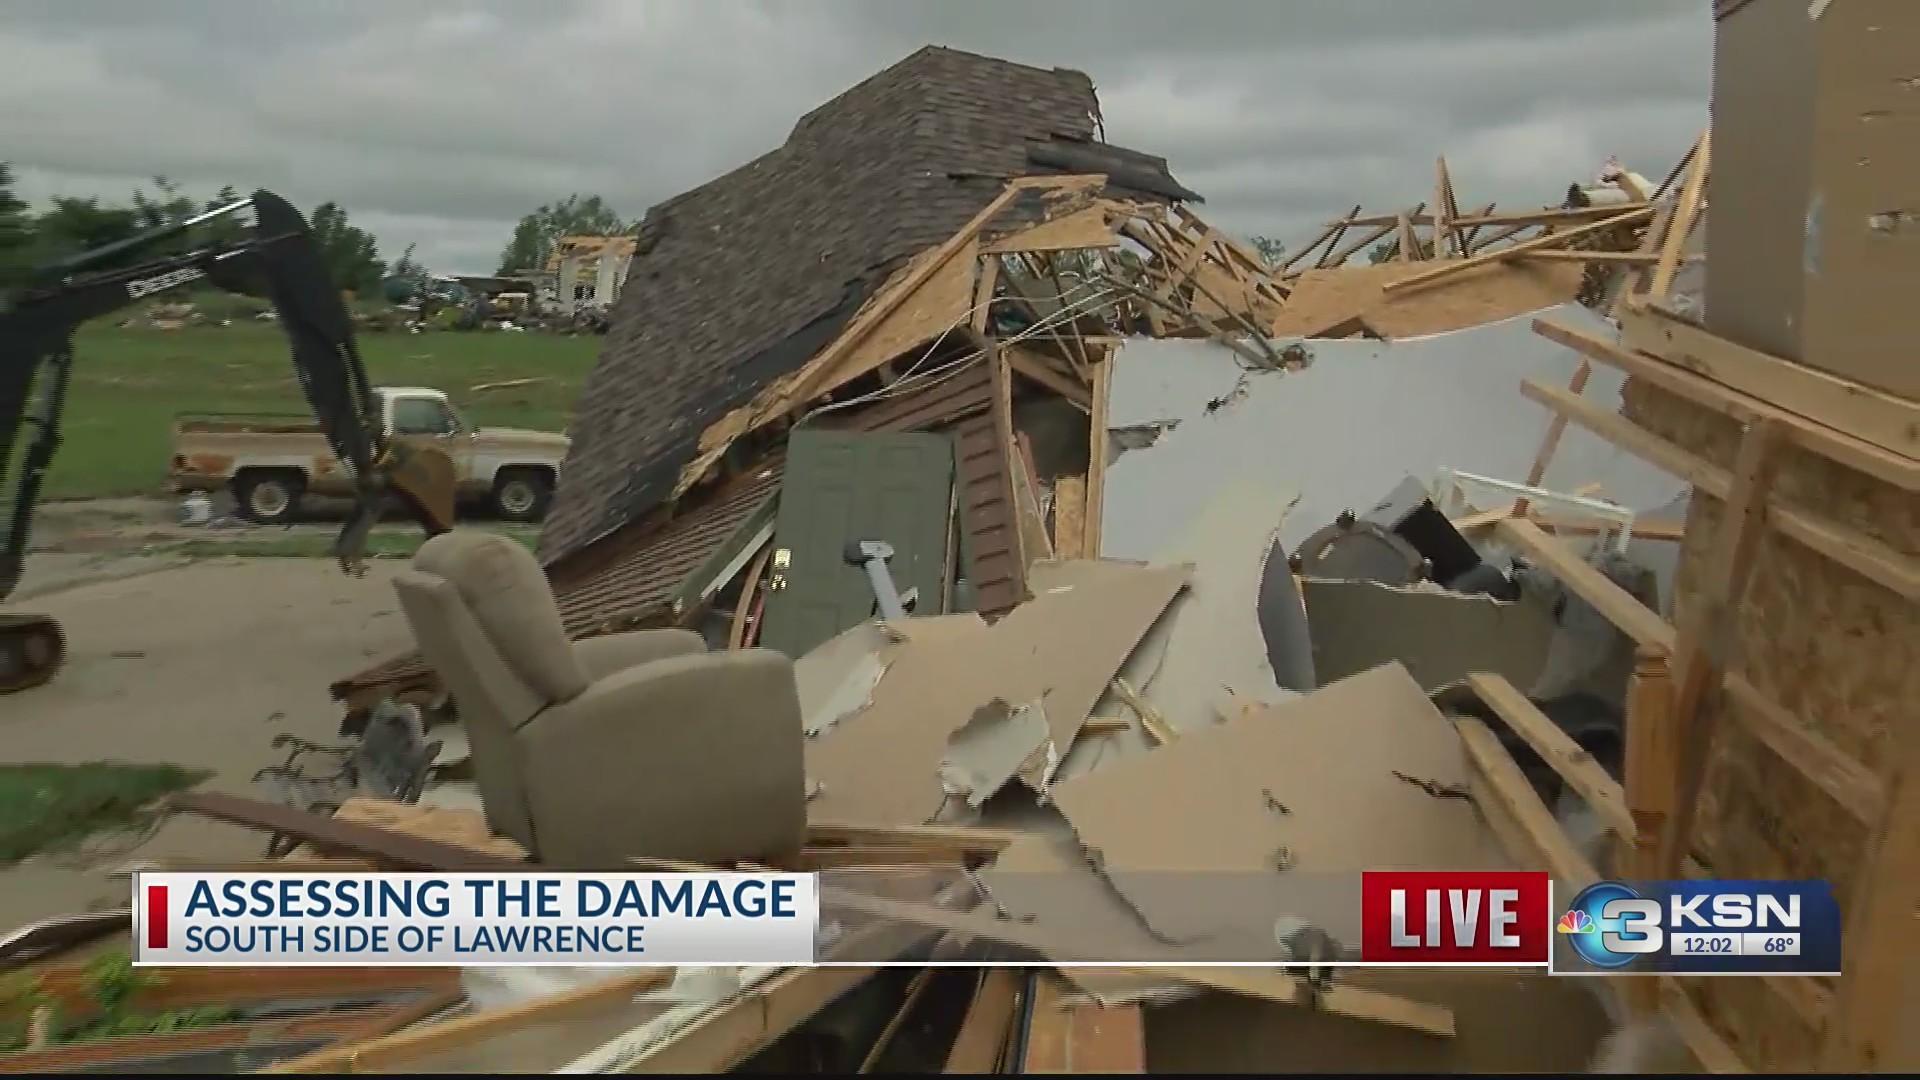 KSN_gets_look_at_tornado_devastation_sou_0_20190529171547-846624078-846624078